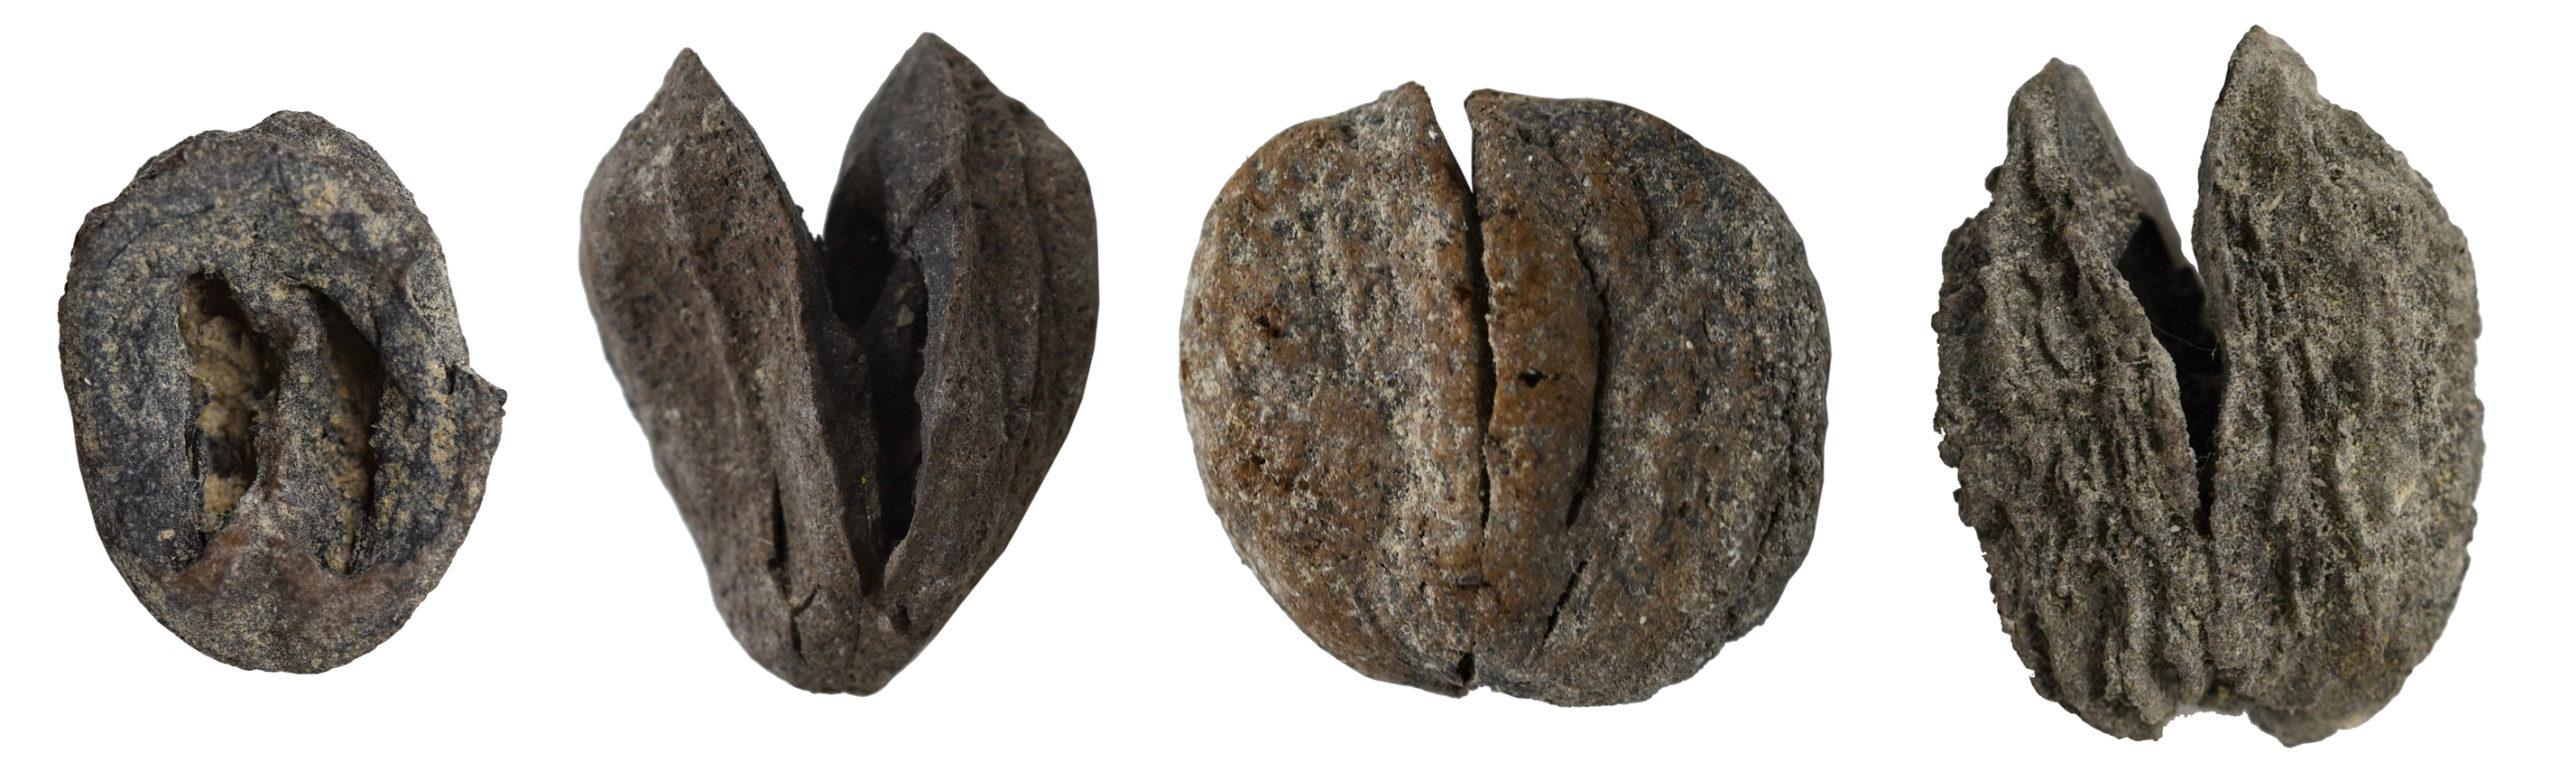 Four fossilized hickory fruits